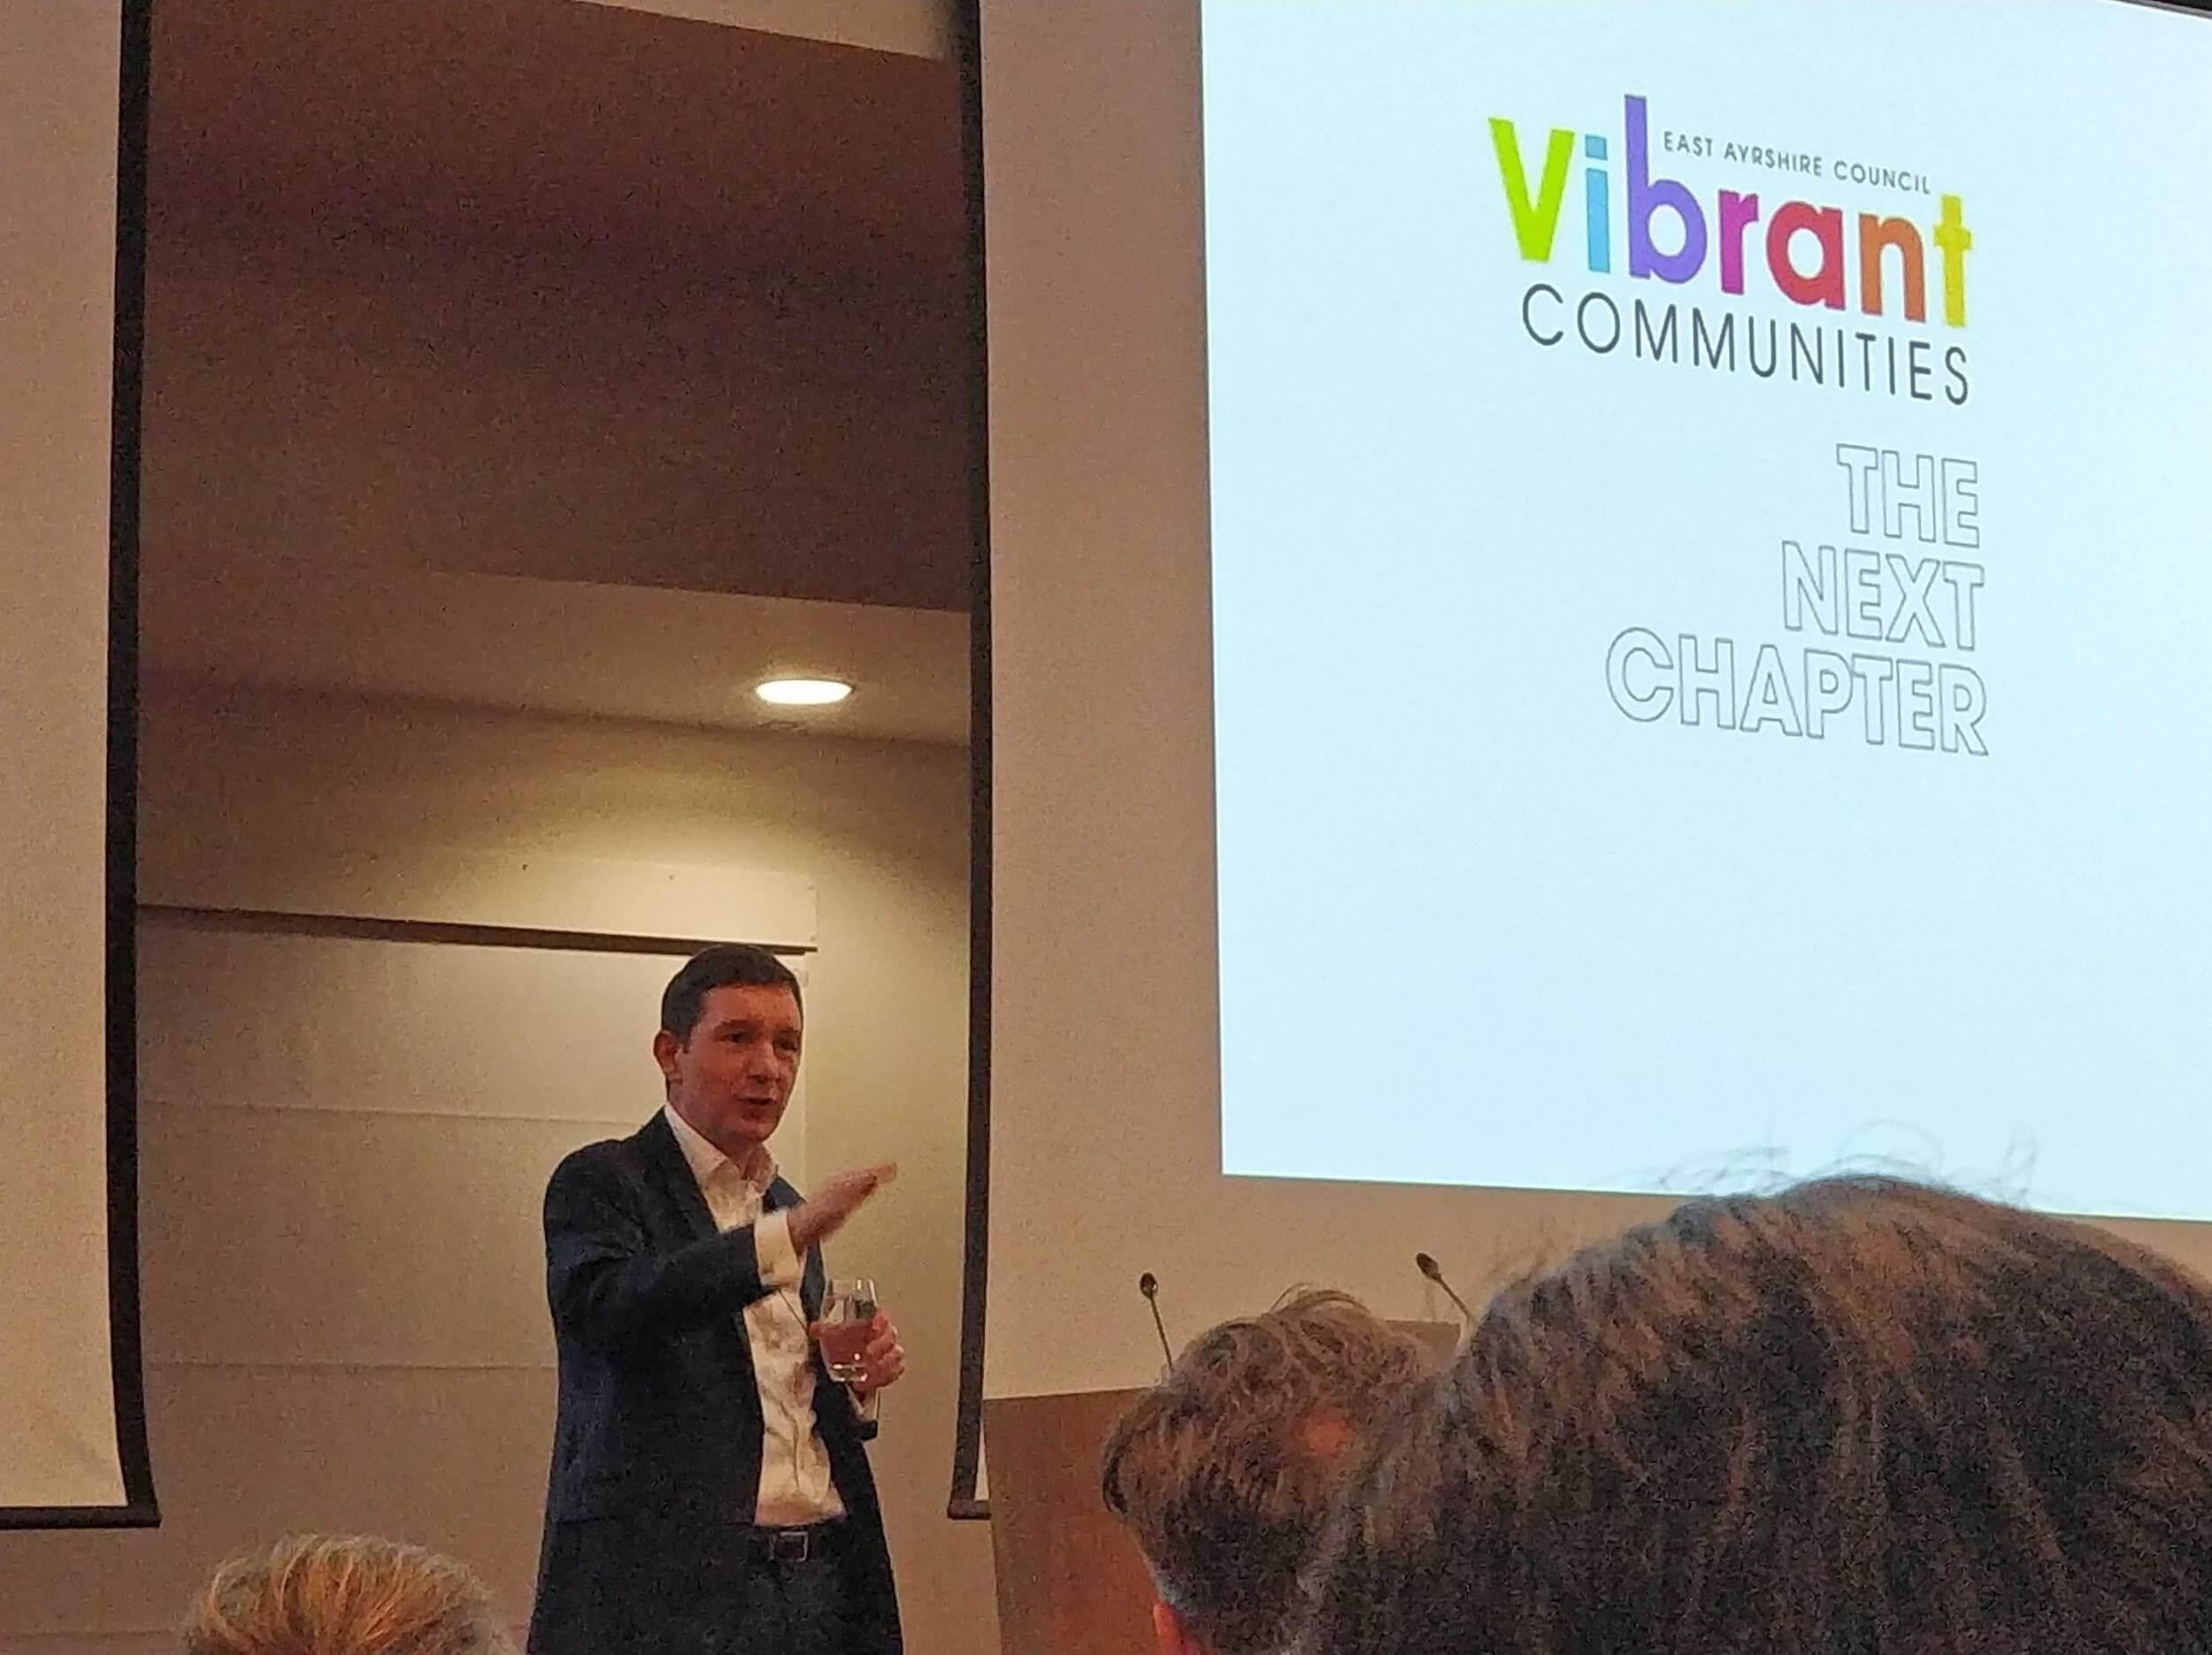 Cormac Russell, MD of Nurture Development